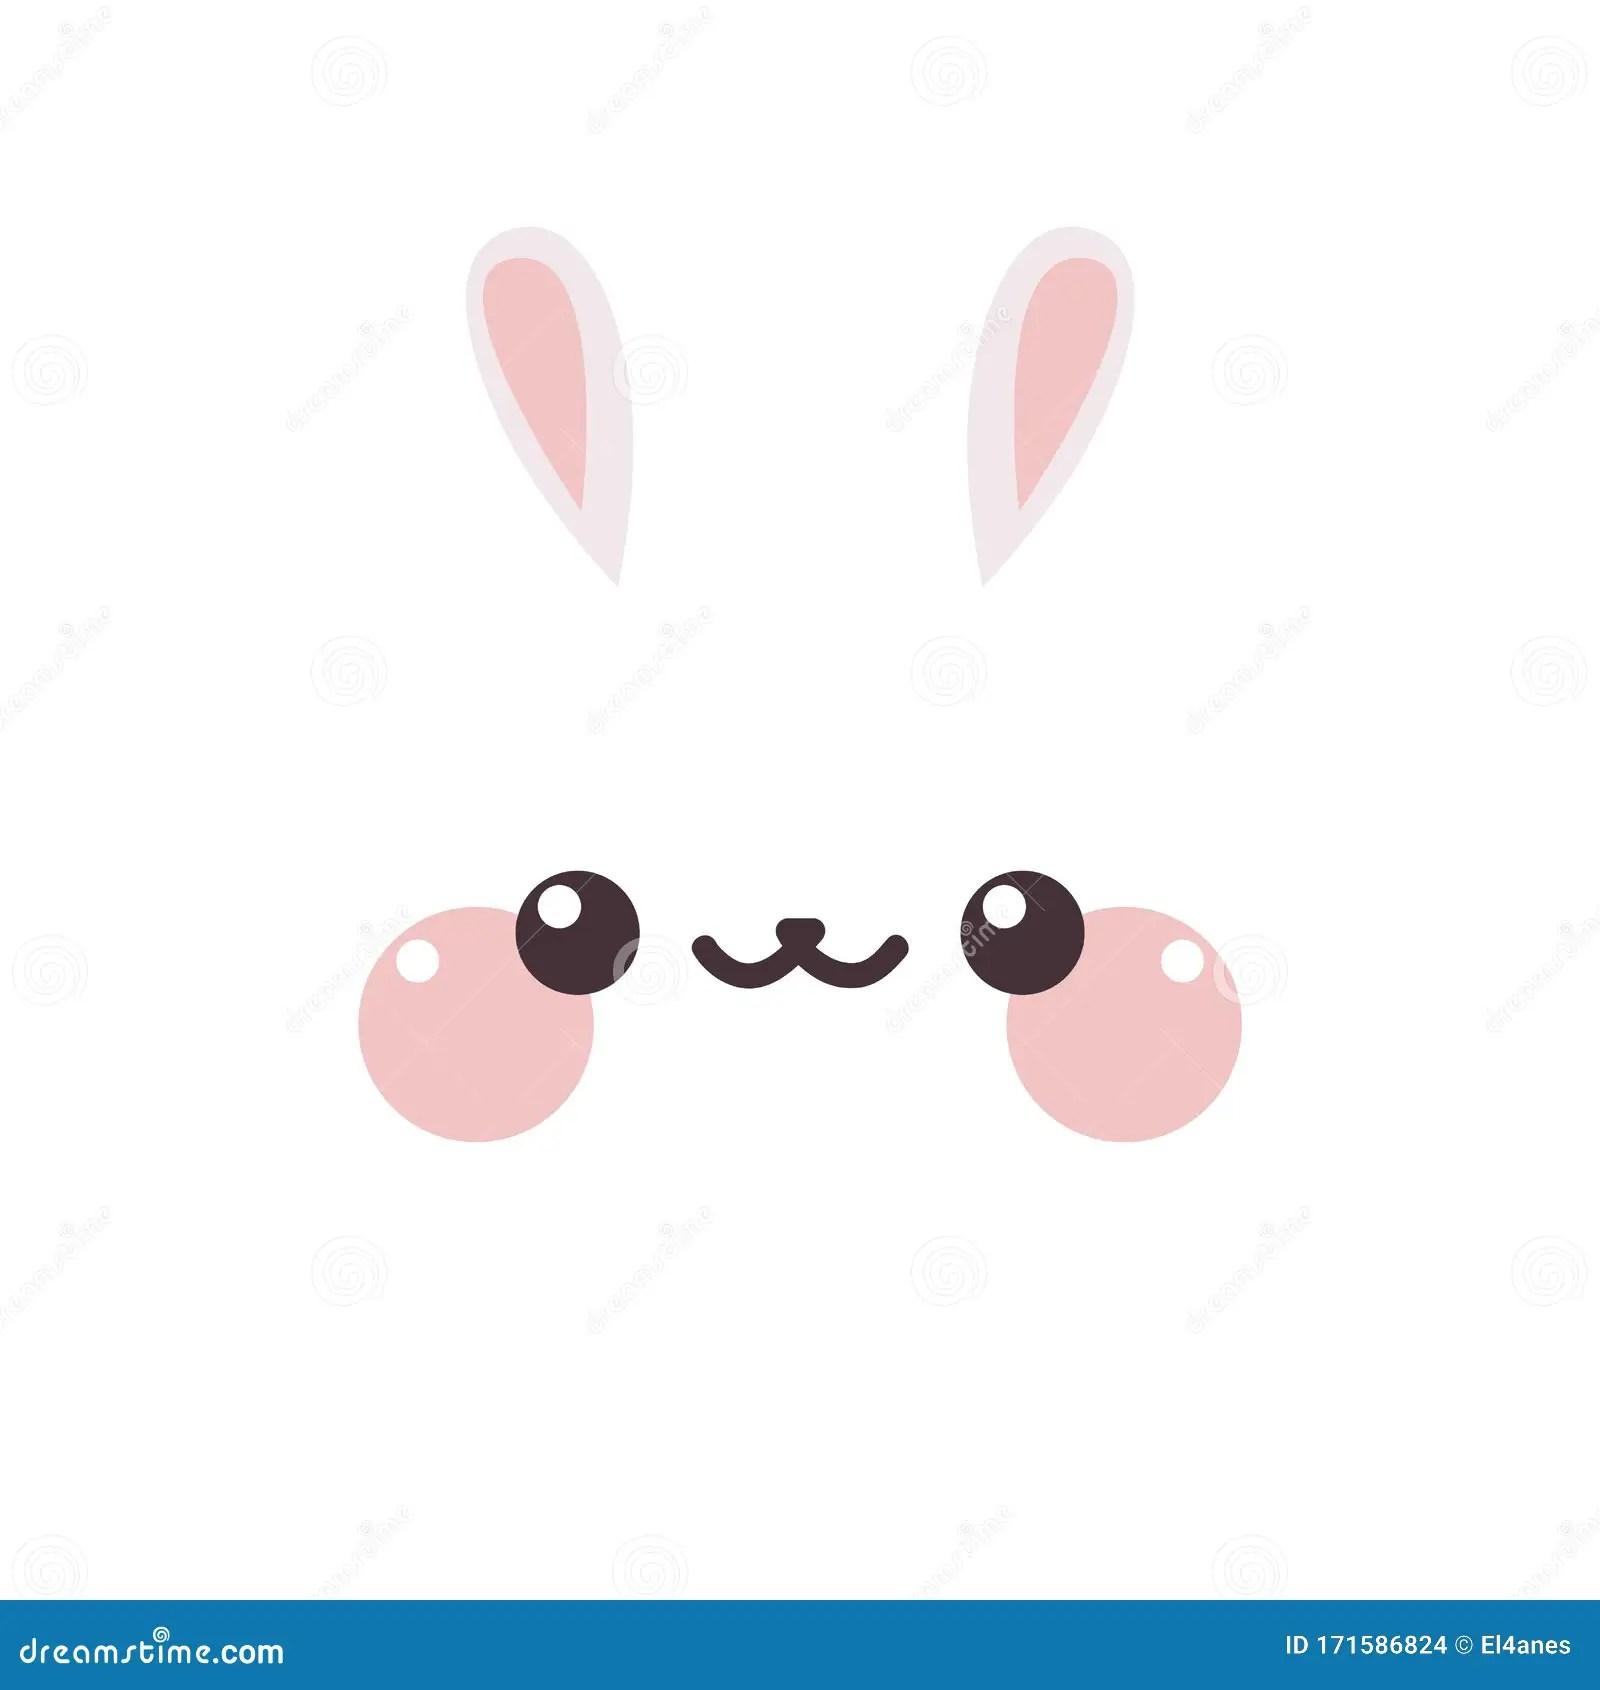 Cute Cartoon Bunny Face Stock Vector Illustration Of Cartoon 171586824